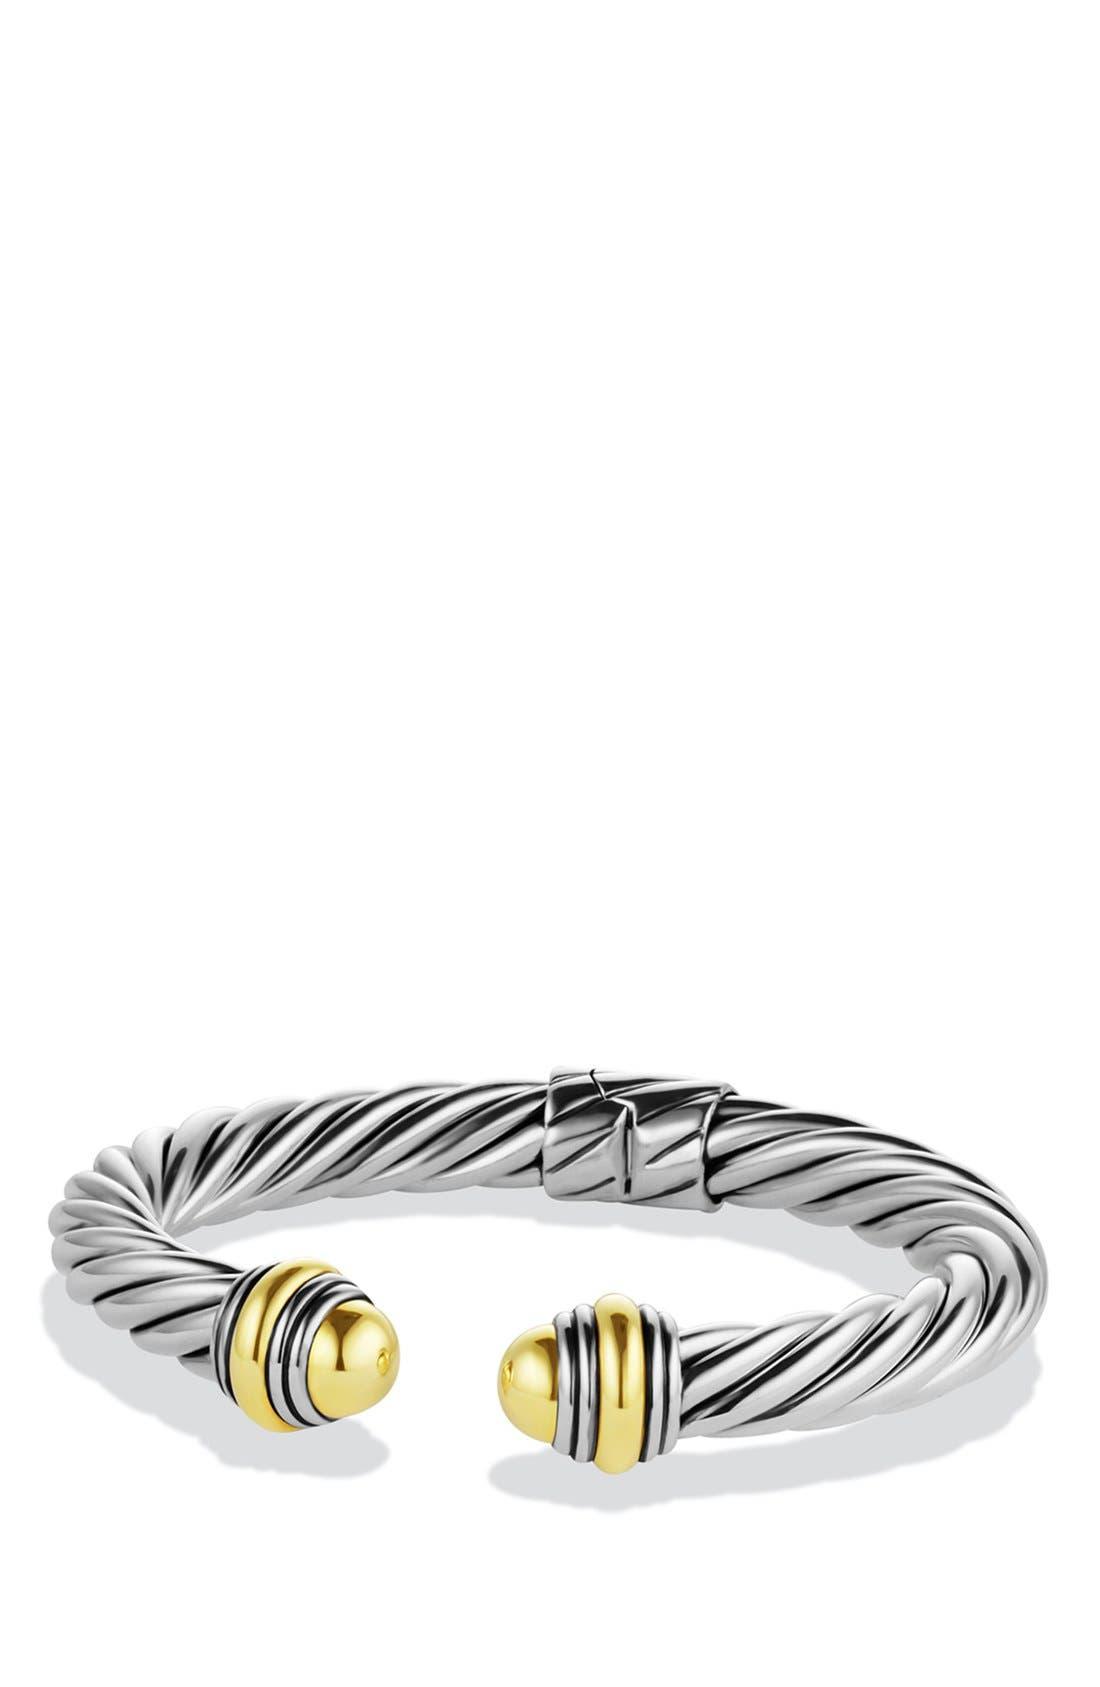 Main Image - David Yurman Cable Classics Bracelet with 14K Gold, 7mm